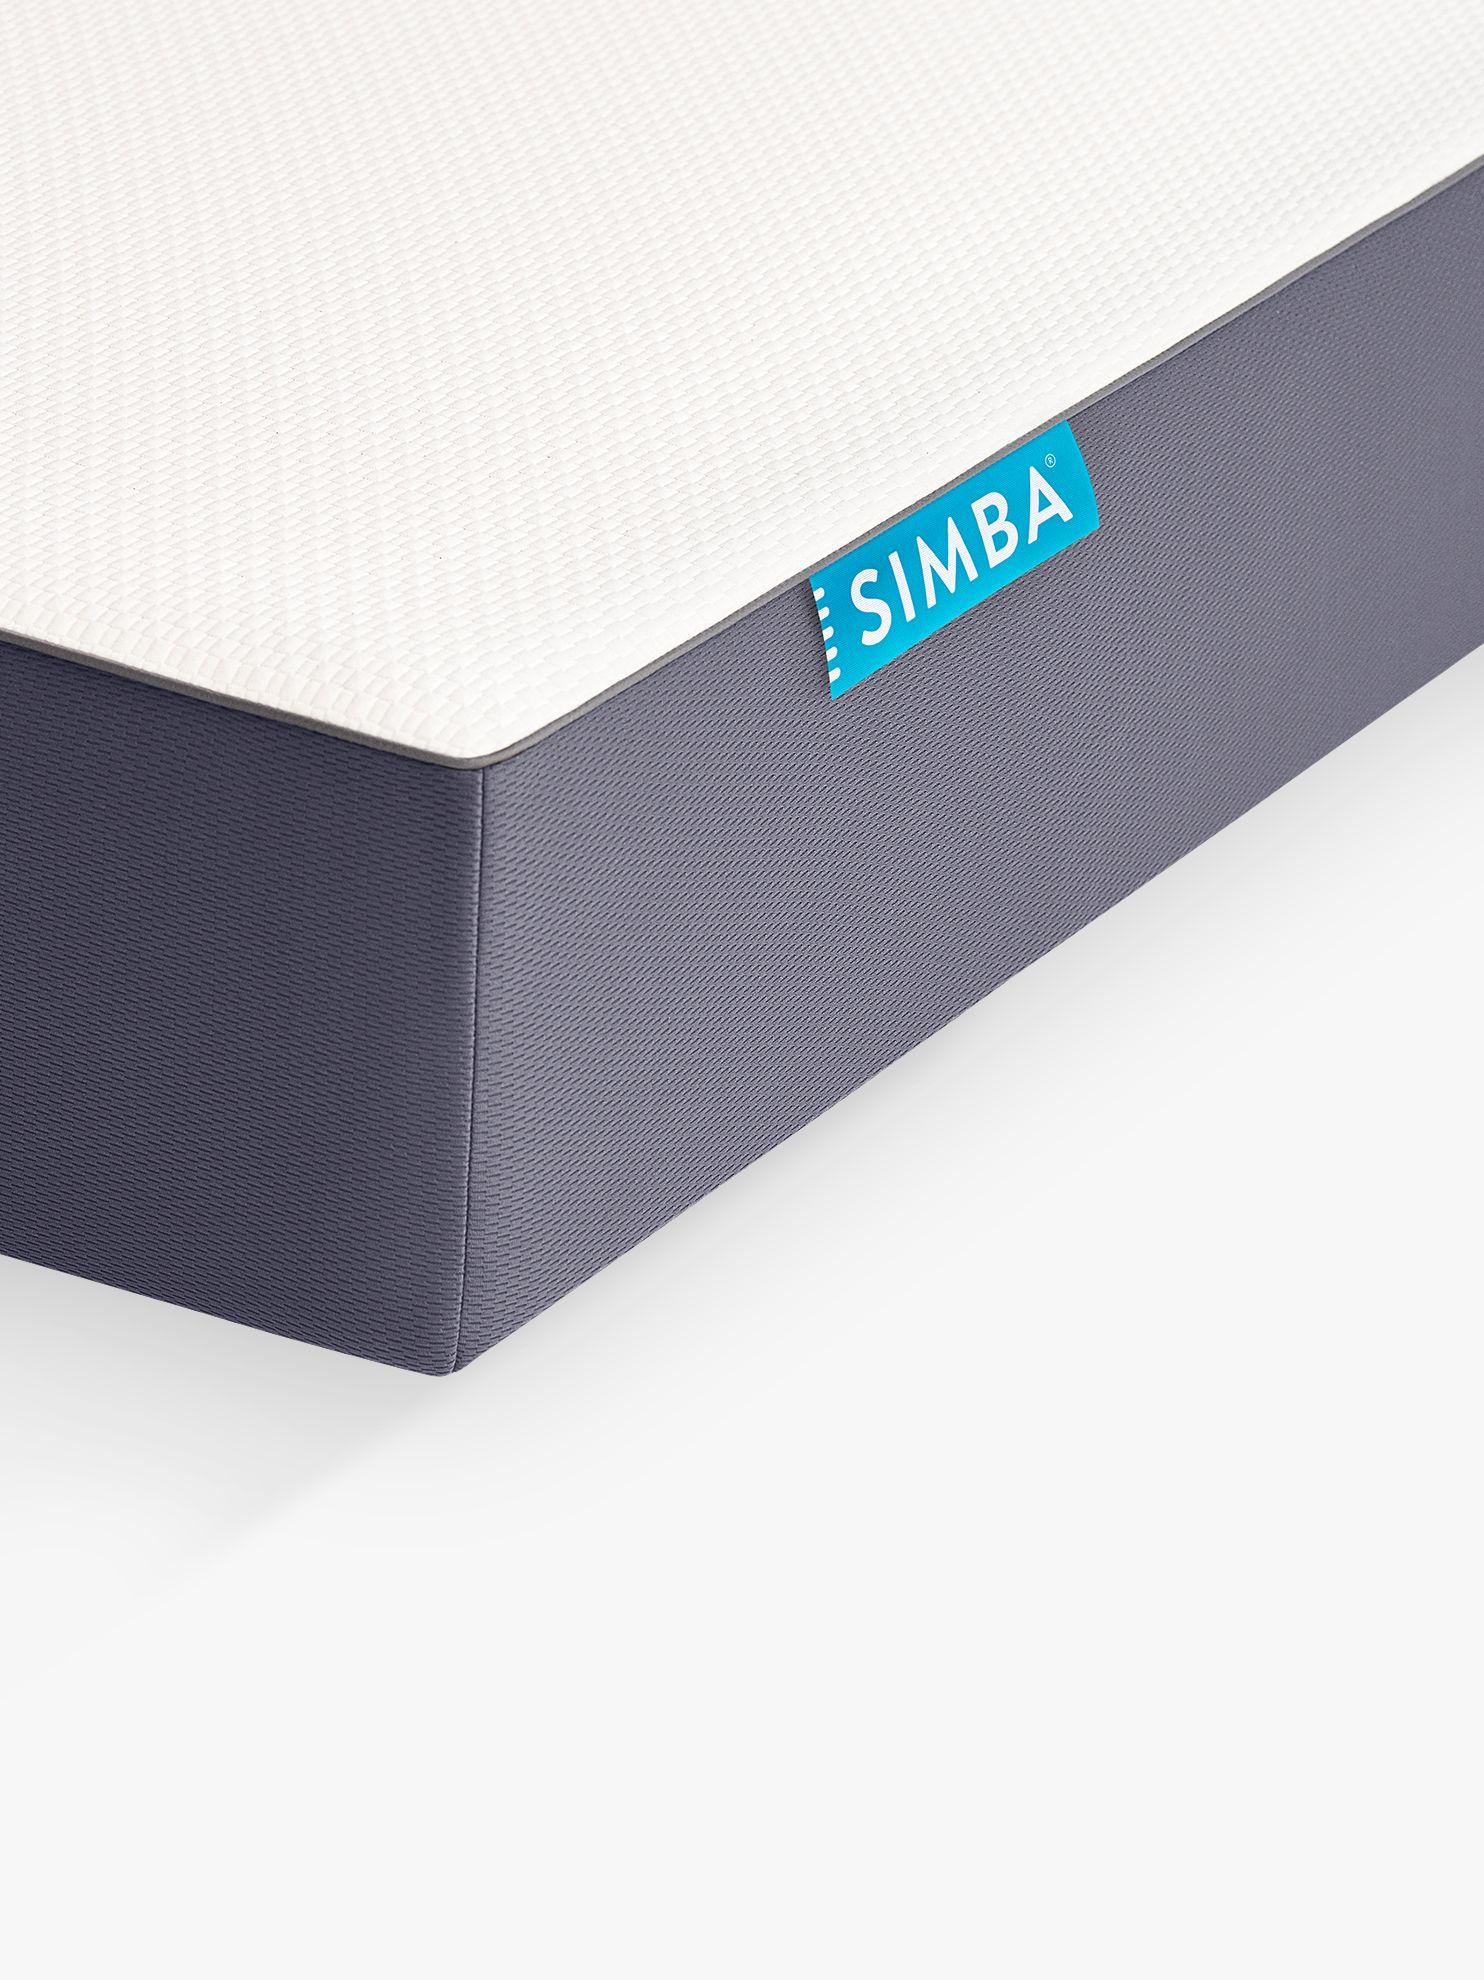 Simba SIMBA Hybrid Memory Foam Pocket Spring Mattress, King Size